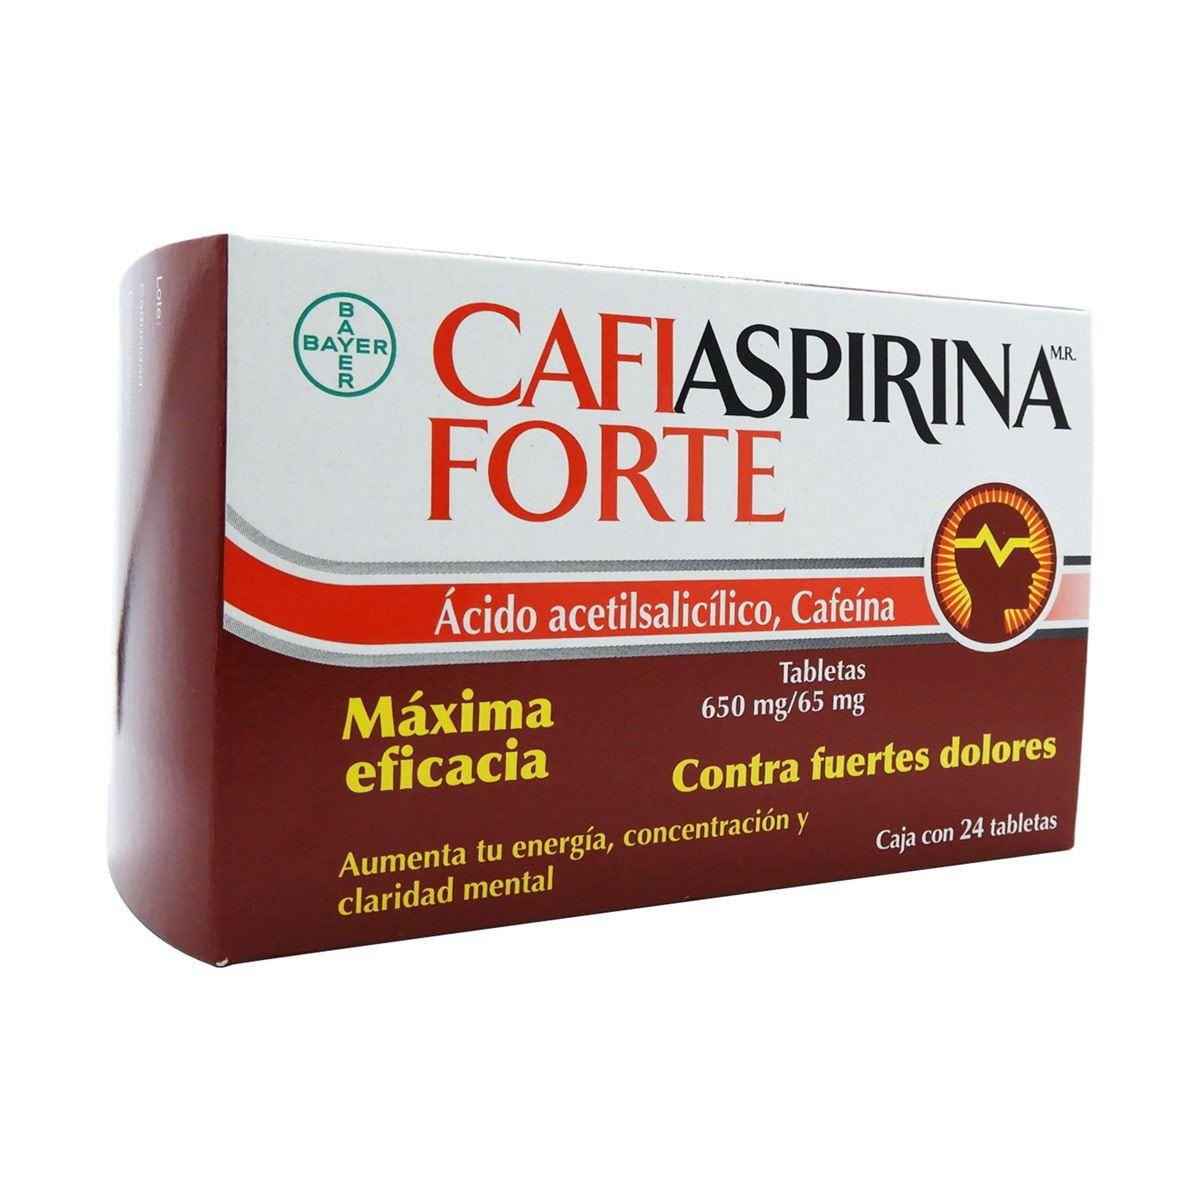 Cafiaspirina forte 24 tabletas  - Sanborns